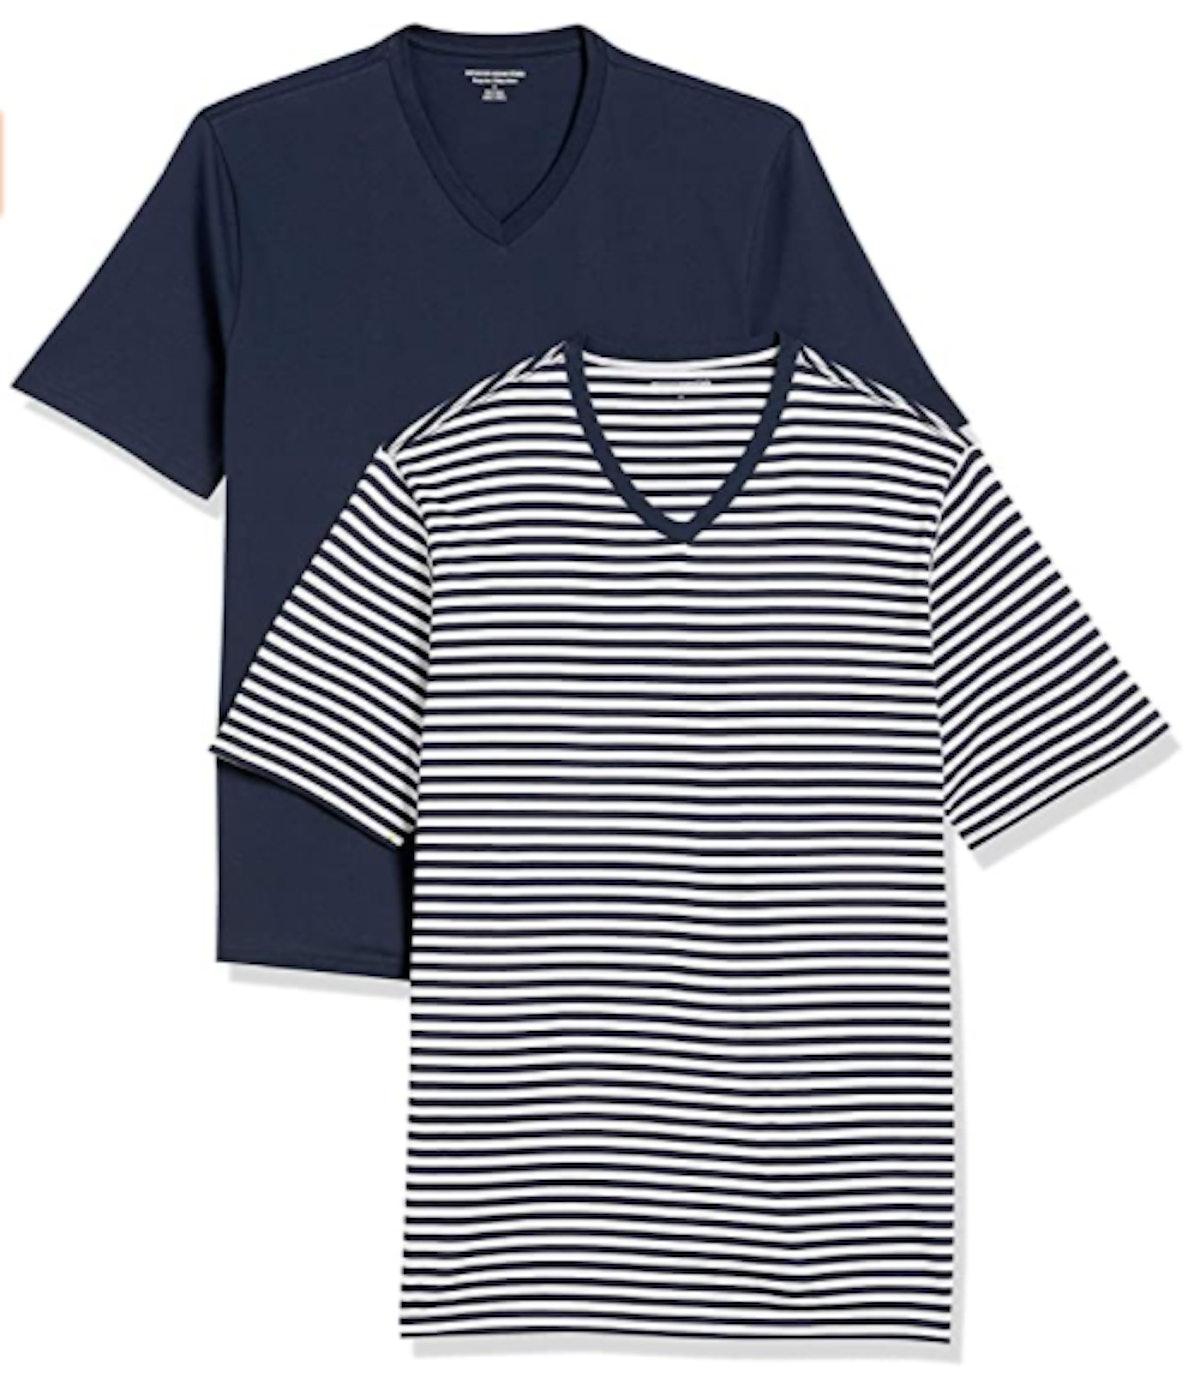 Amazon Essentials Men's Loose-Fit V-Neck T-Shirt (2-Pack)